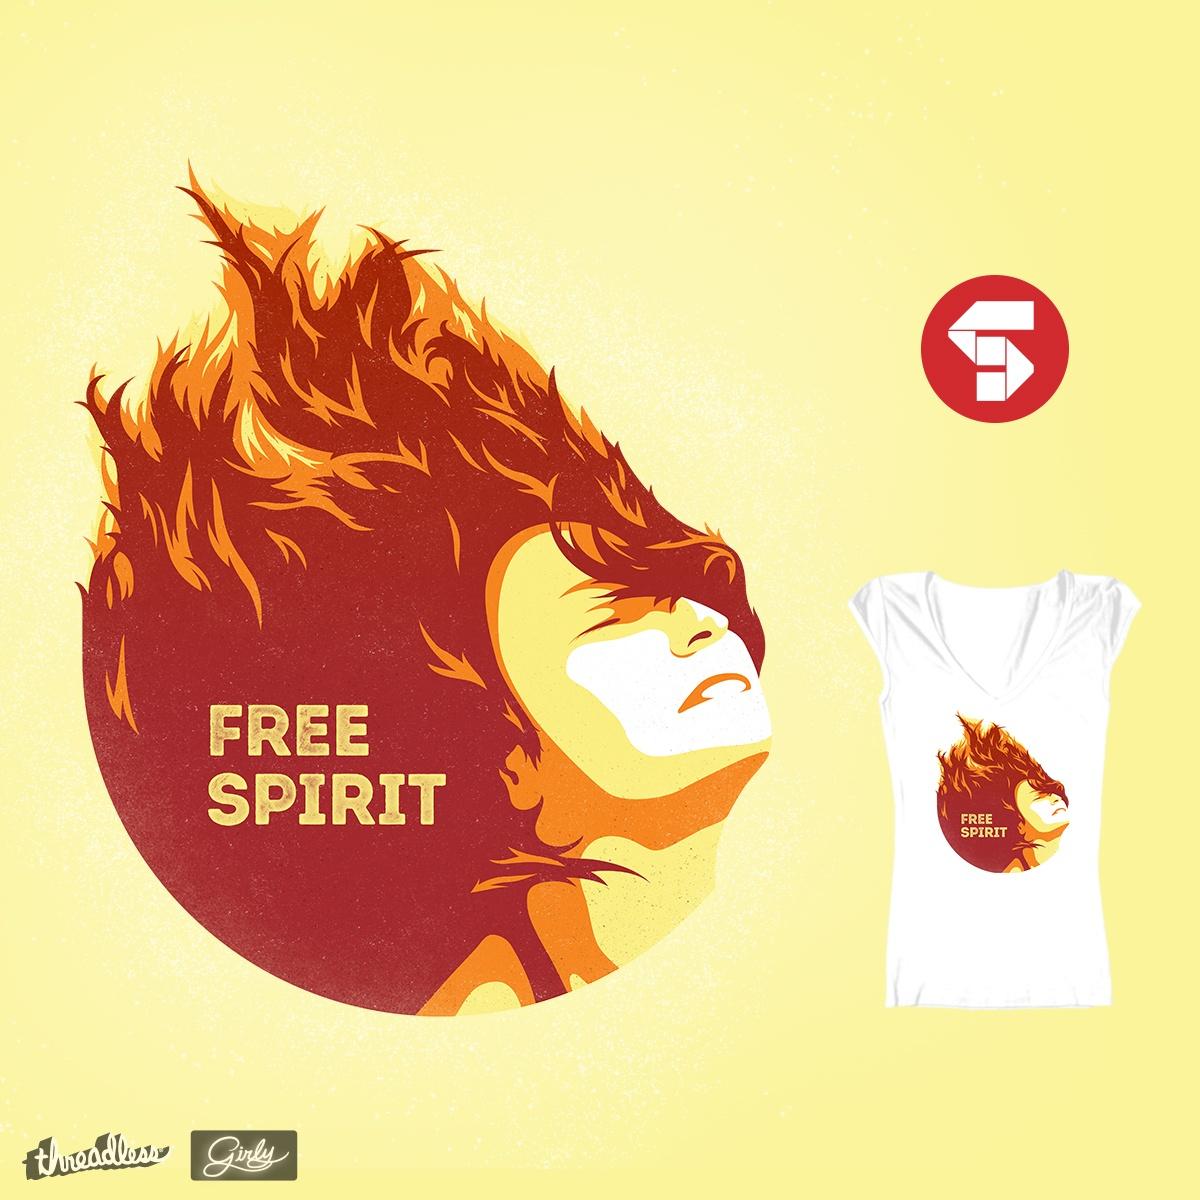 Free Spirit by thomassoto7 on Threadless